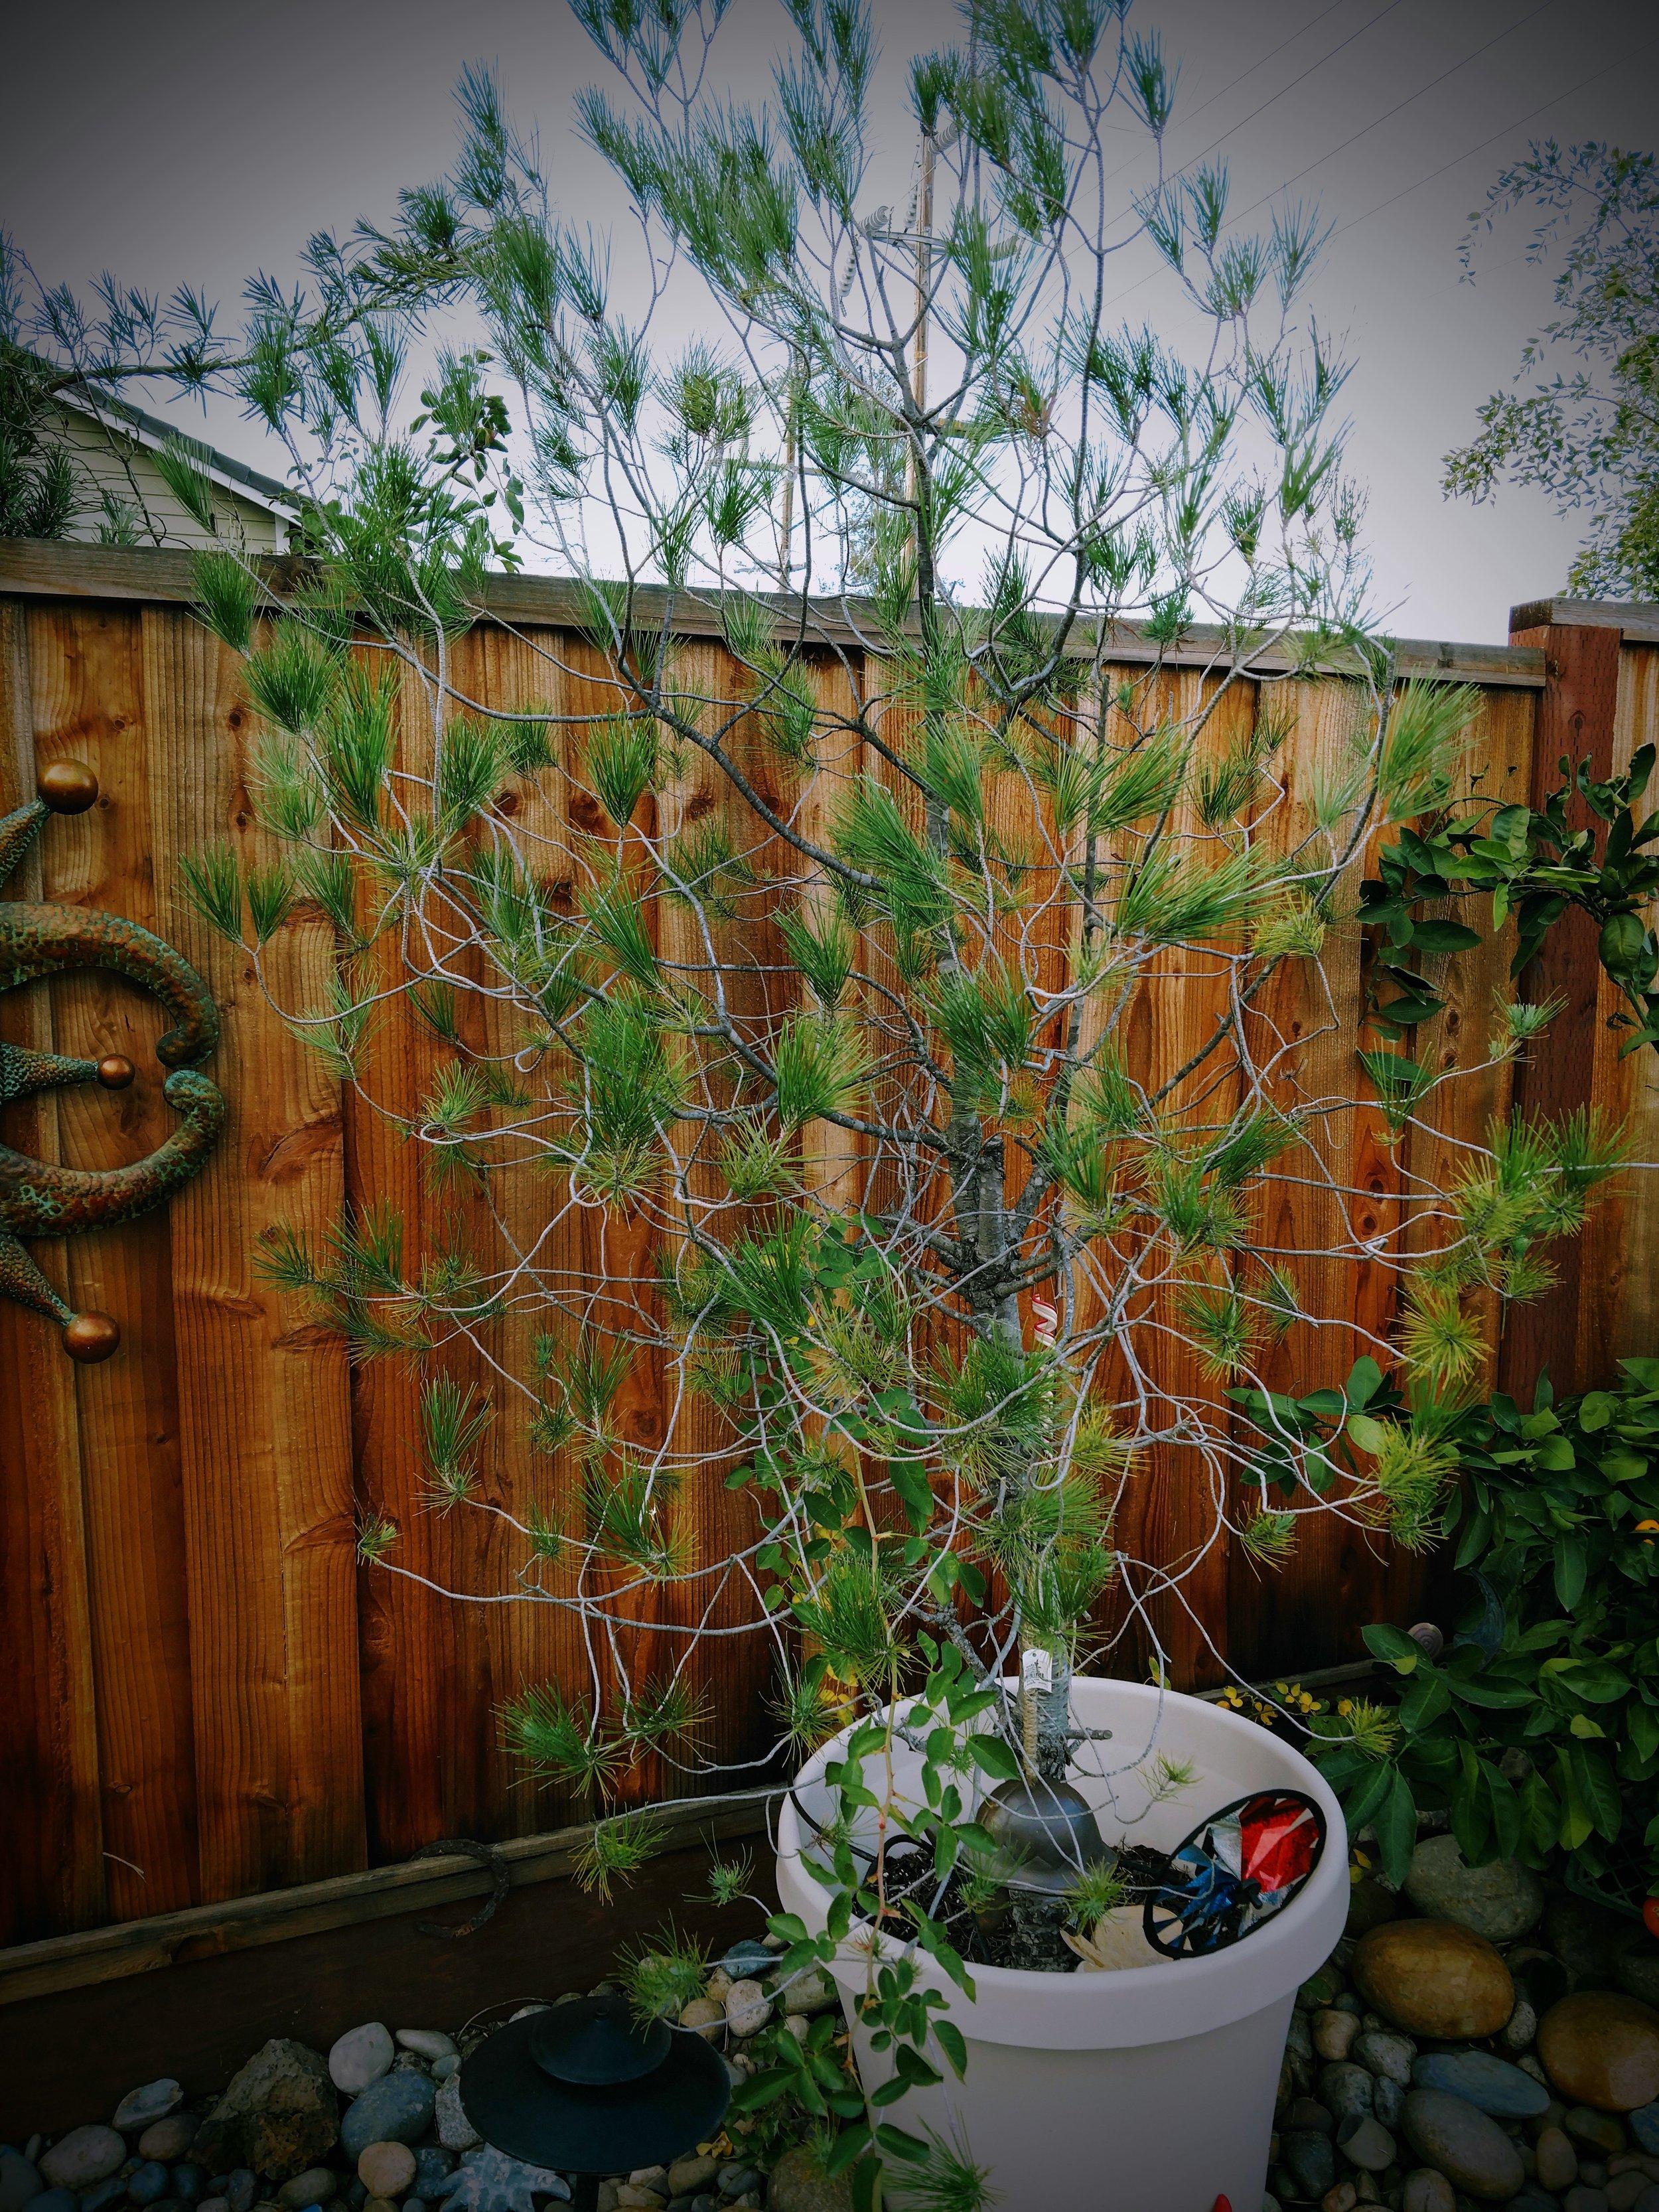 outsidetree.jpg